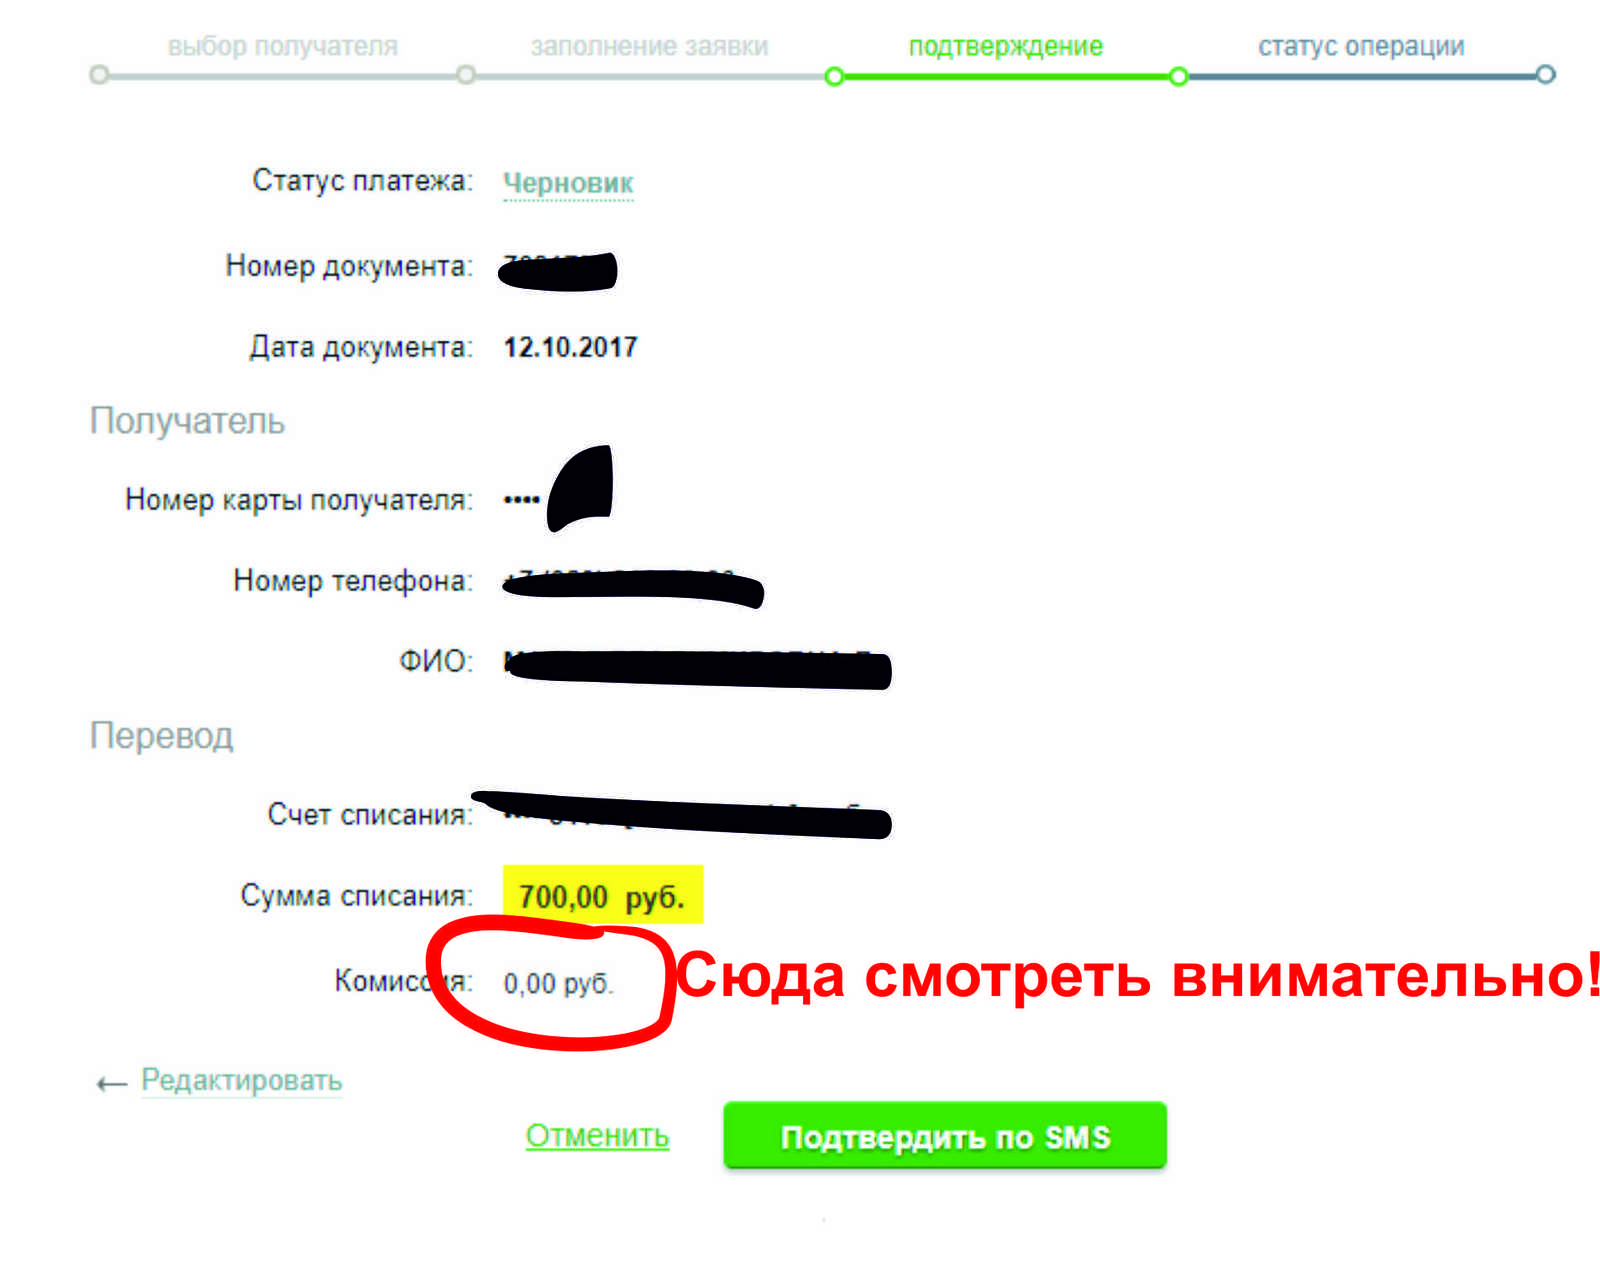 сбербанк онлайн электронный банк